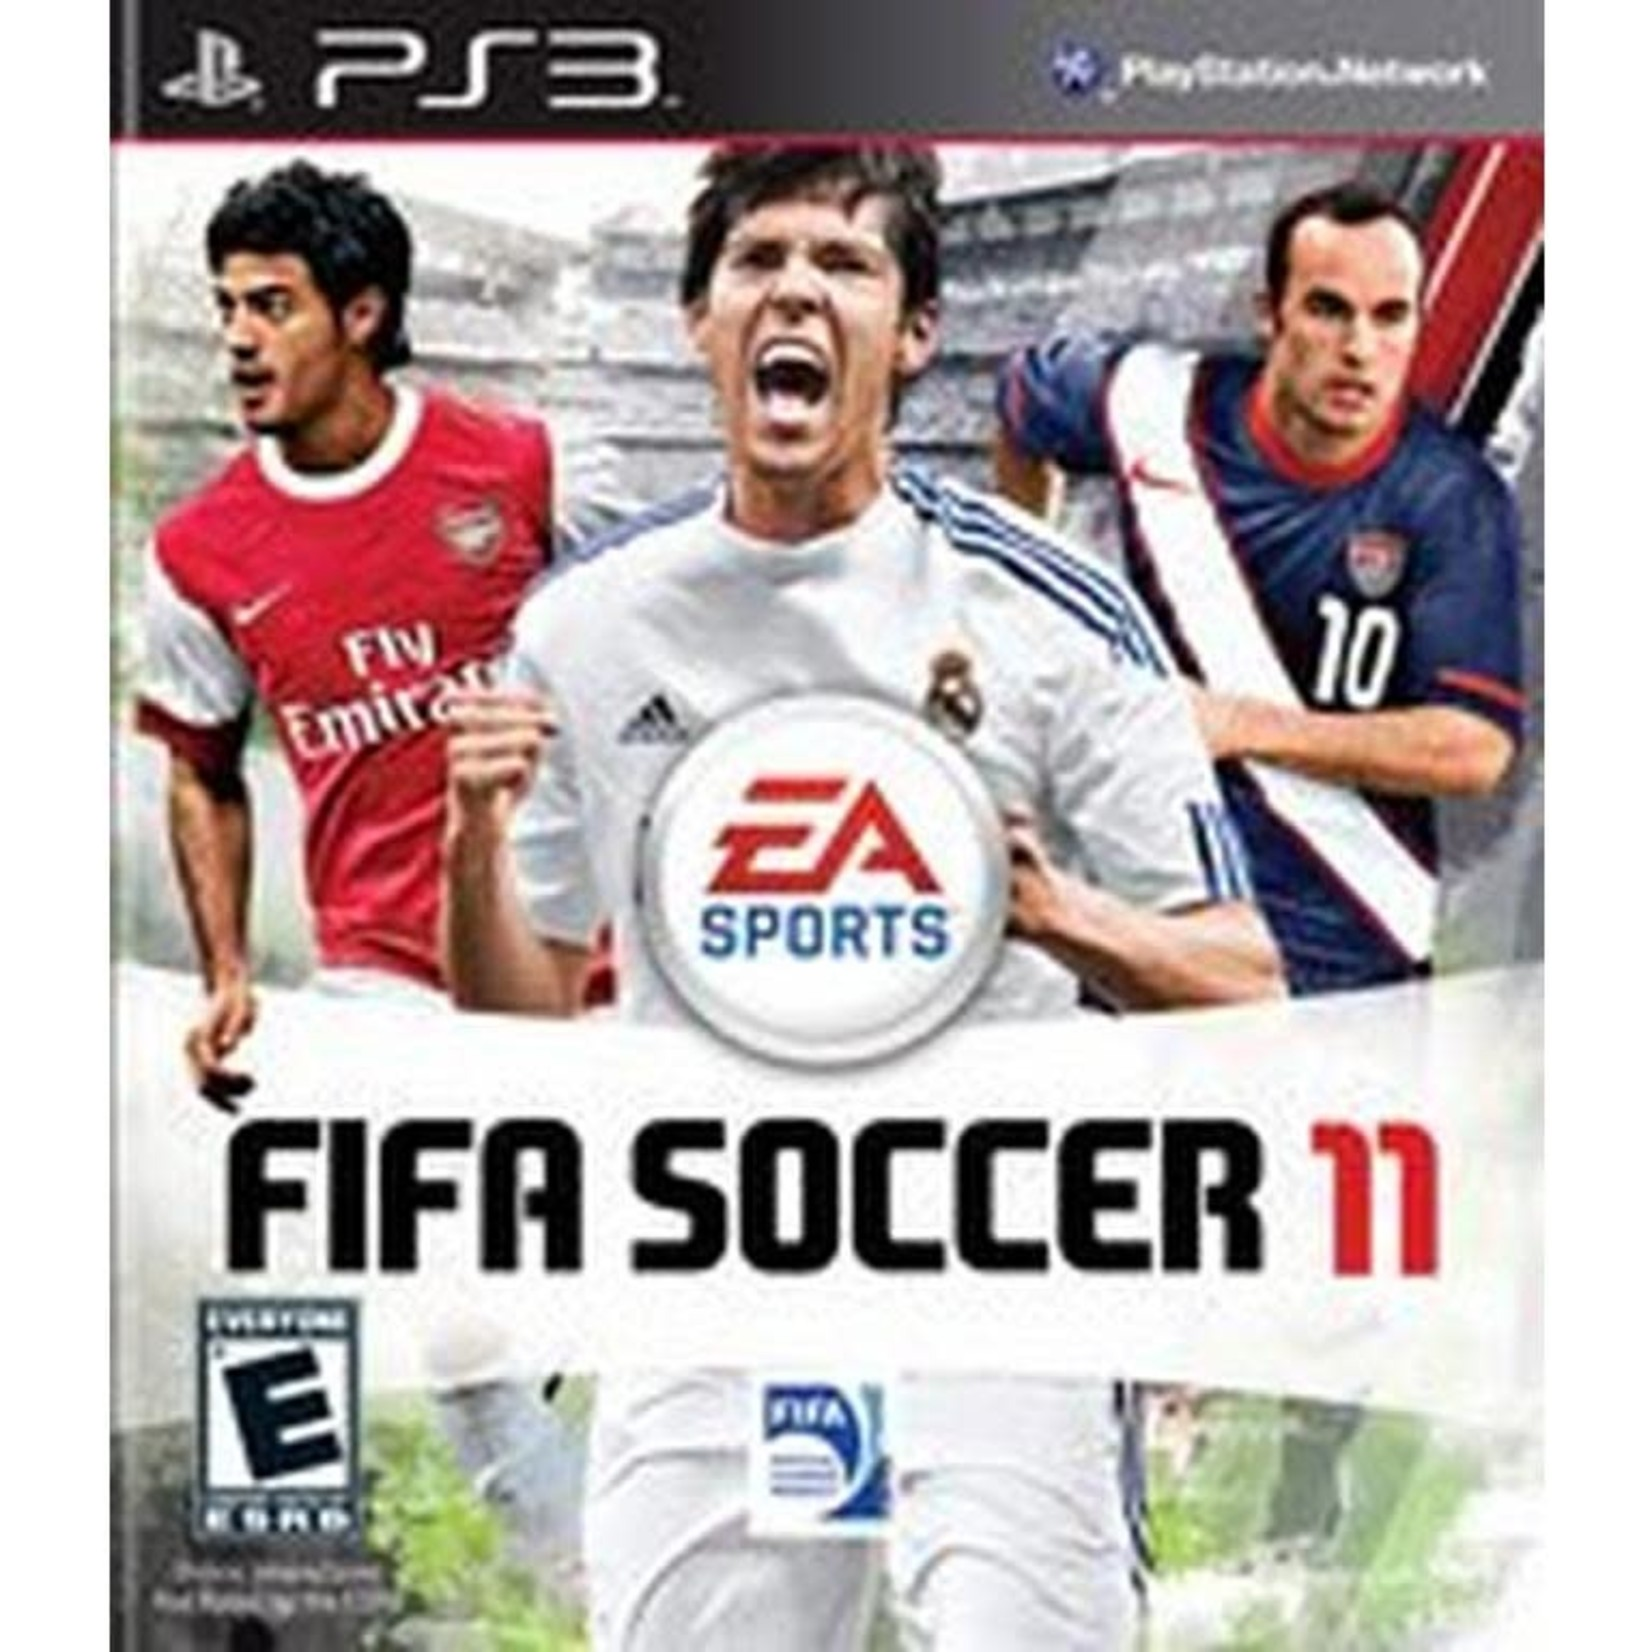 PS3U-FIFA Soccer 2011